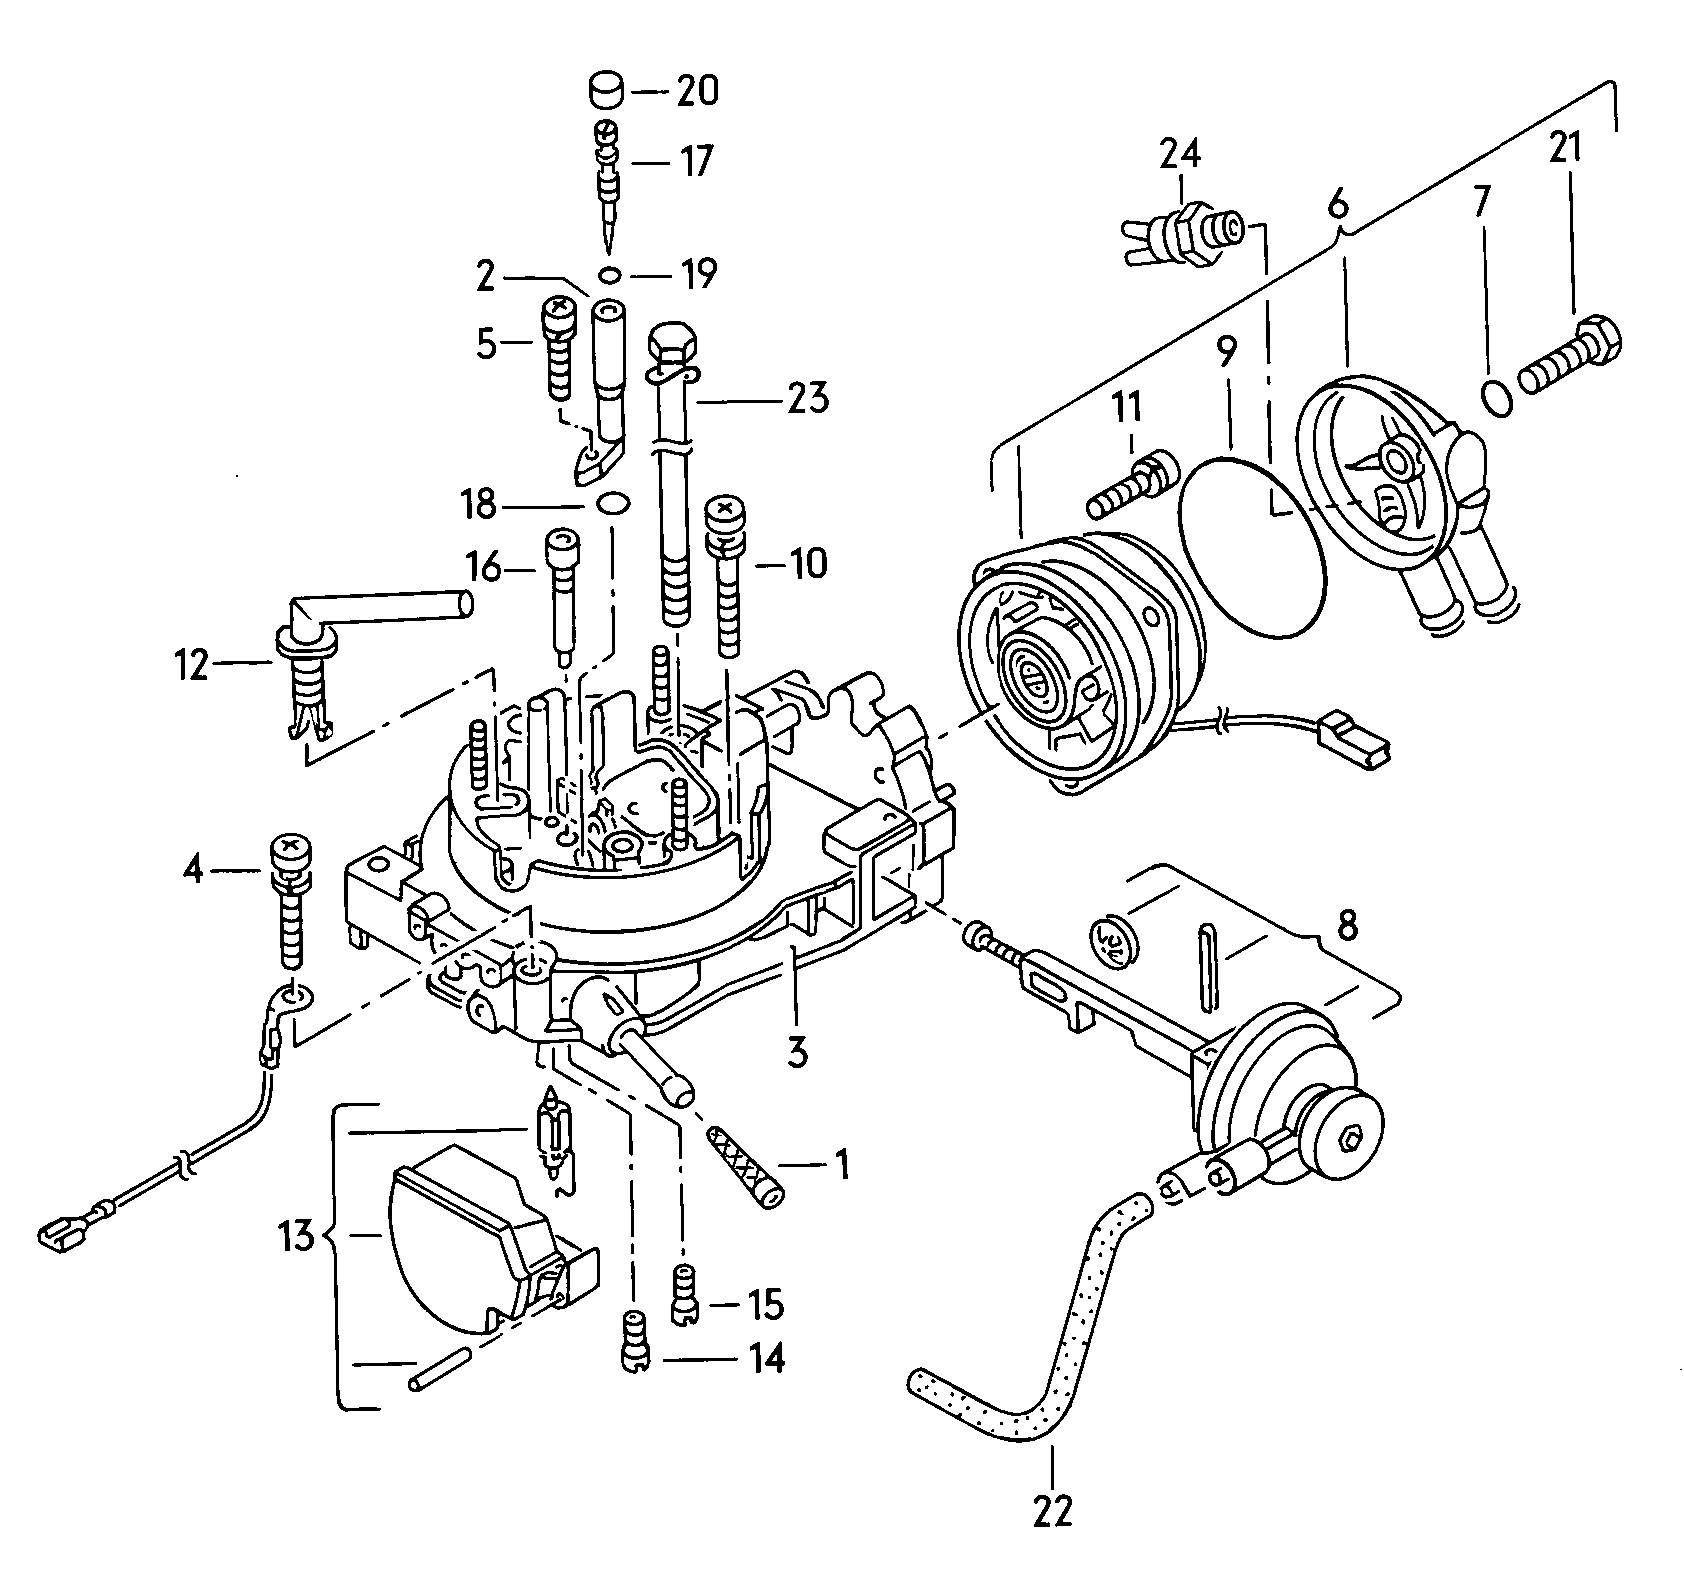 Bentley W12 Engine Diagram